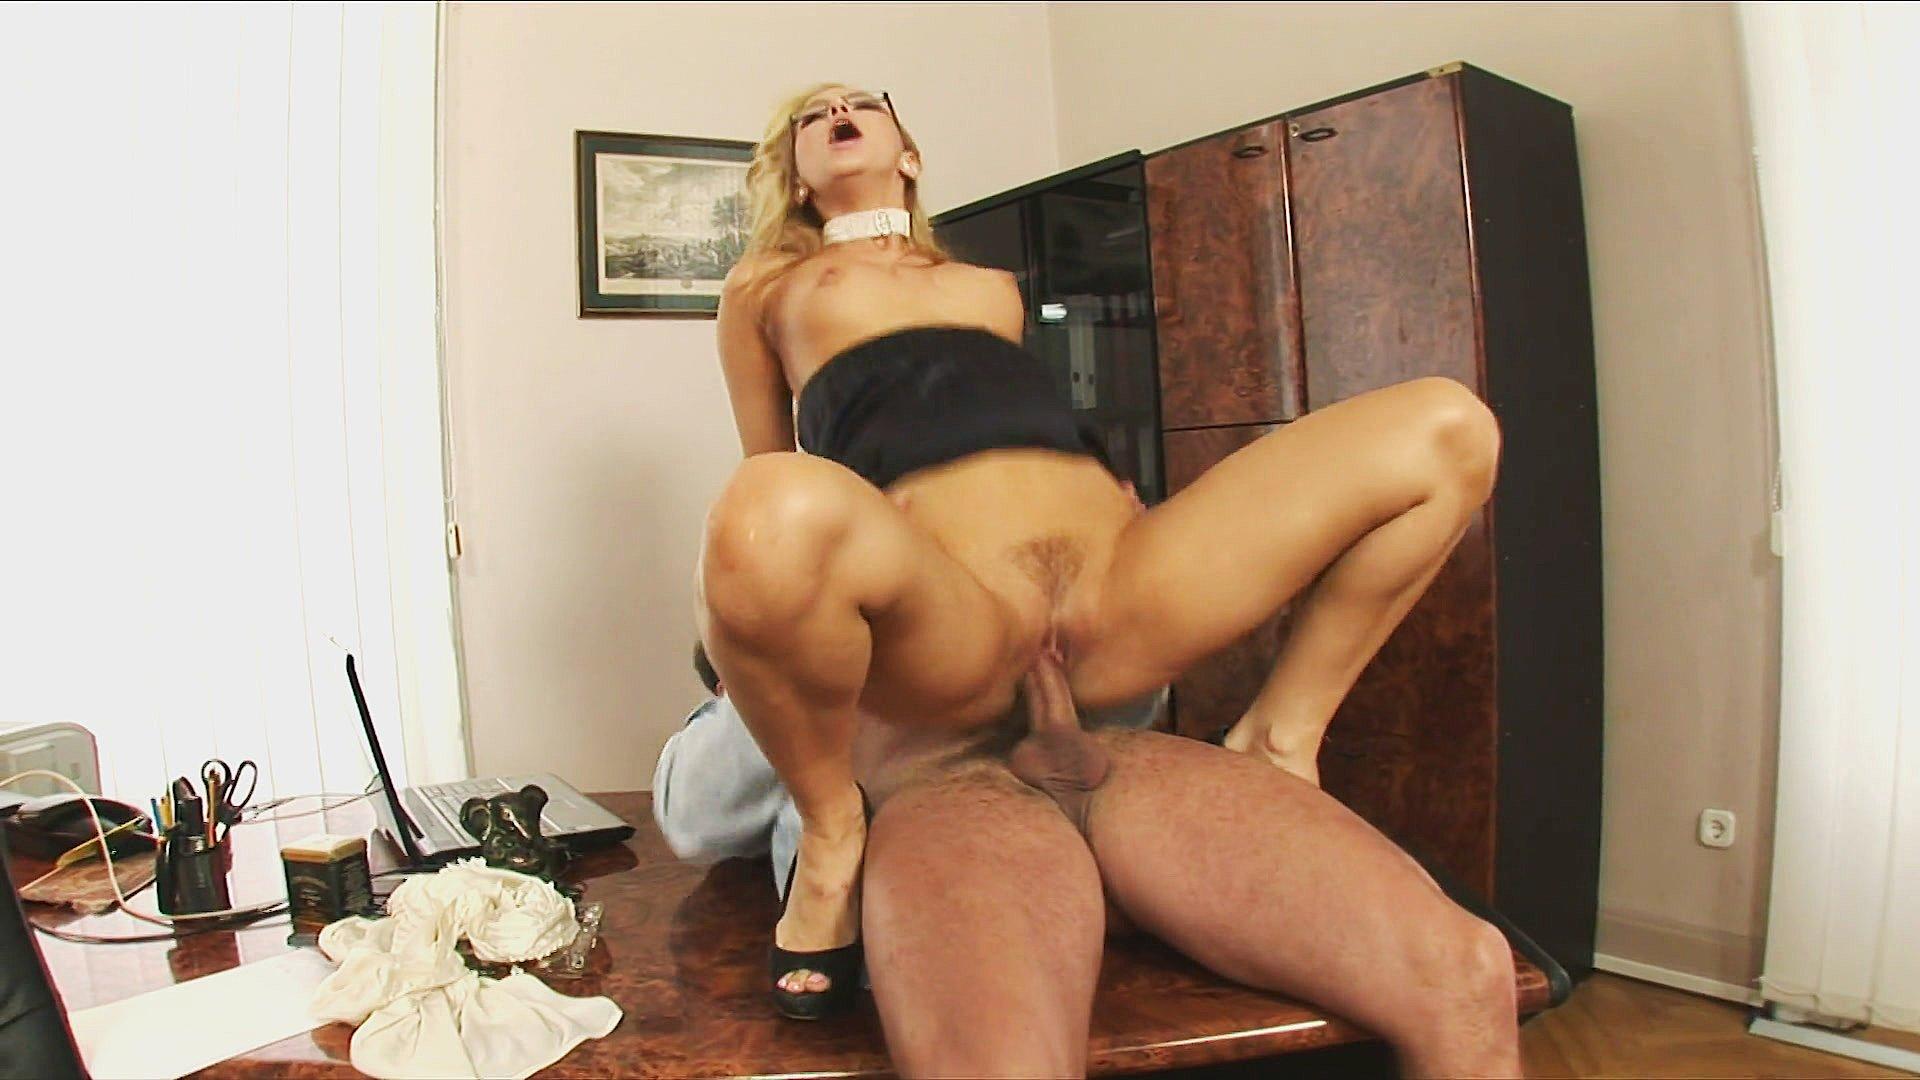 Porn Images & Video Big boobs trampoline